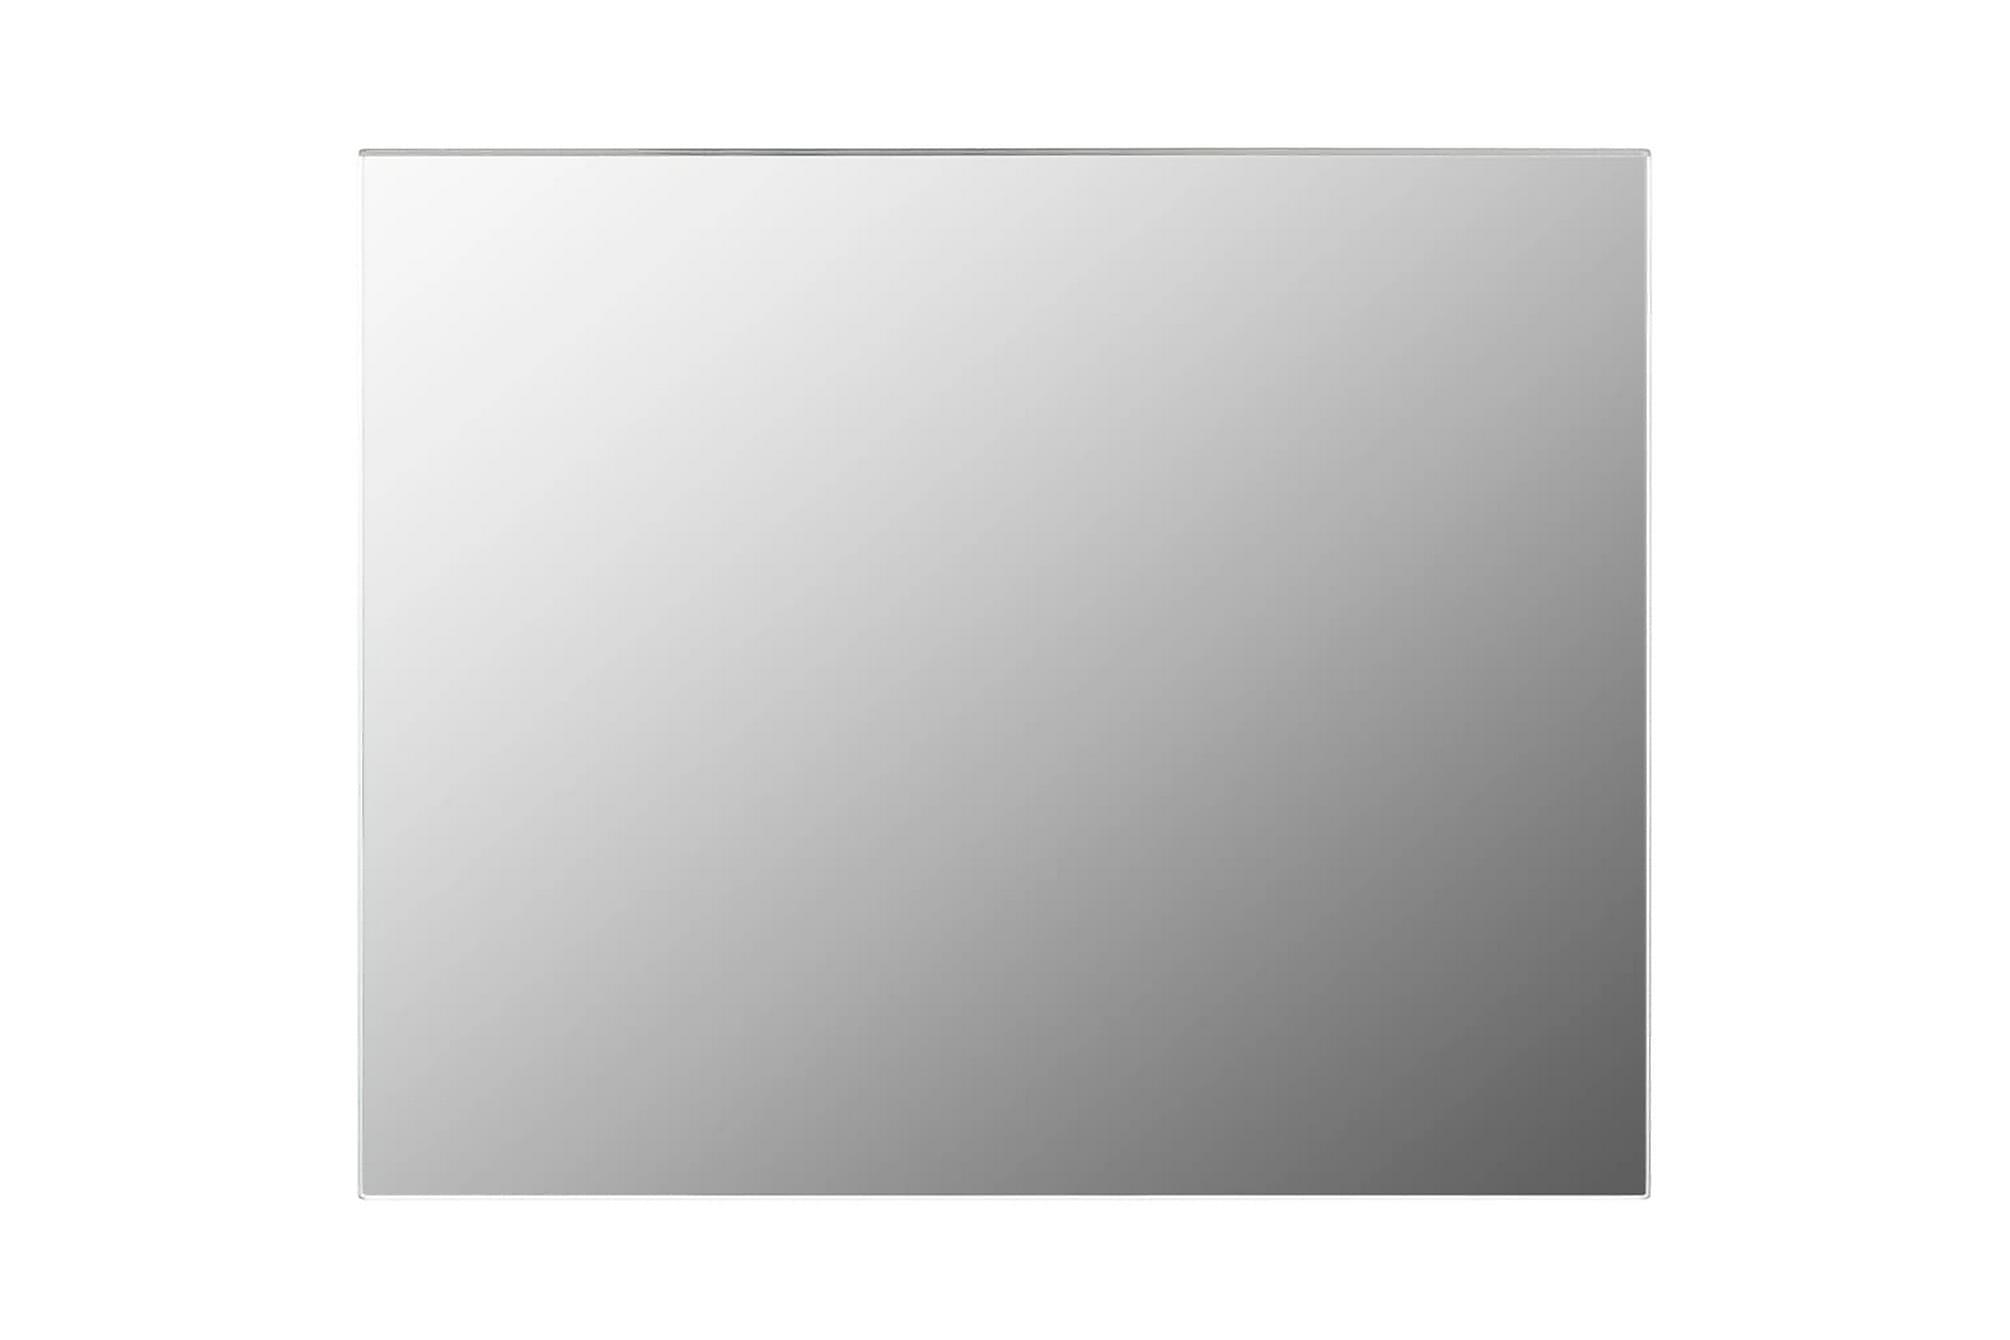 Spegel utan ram 100x60 cm glas